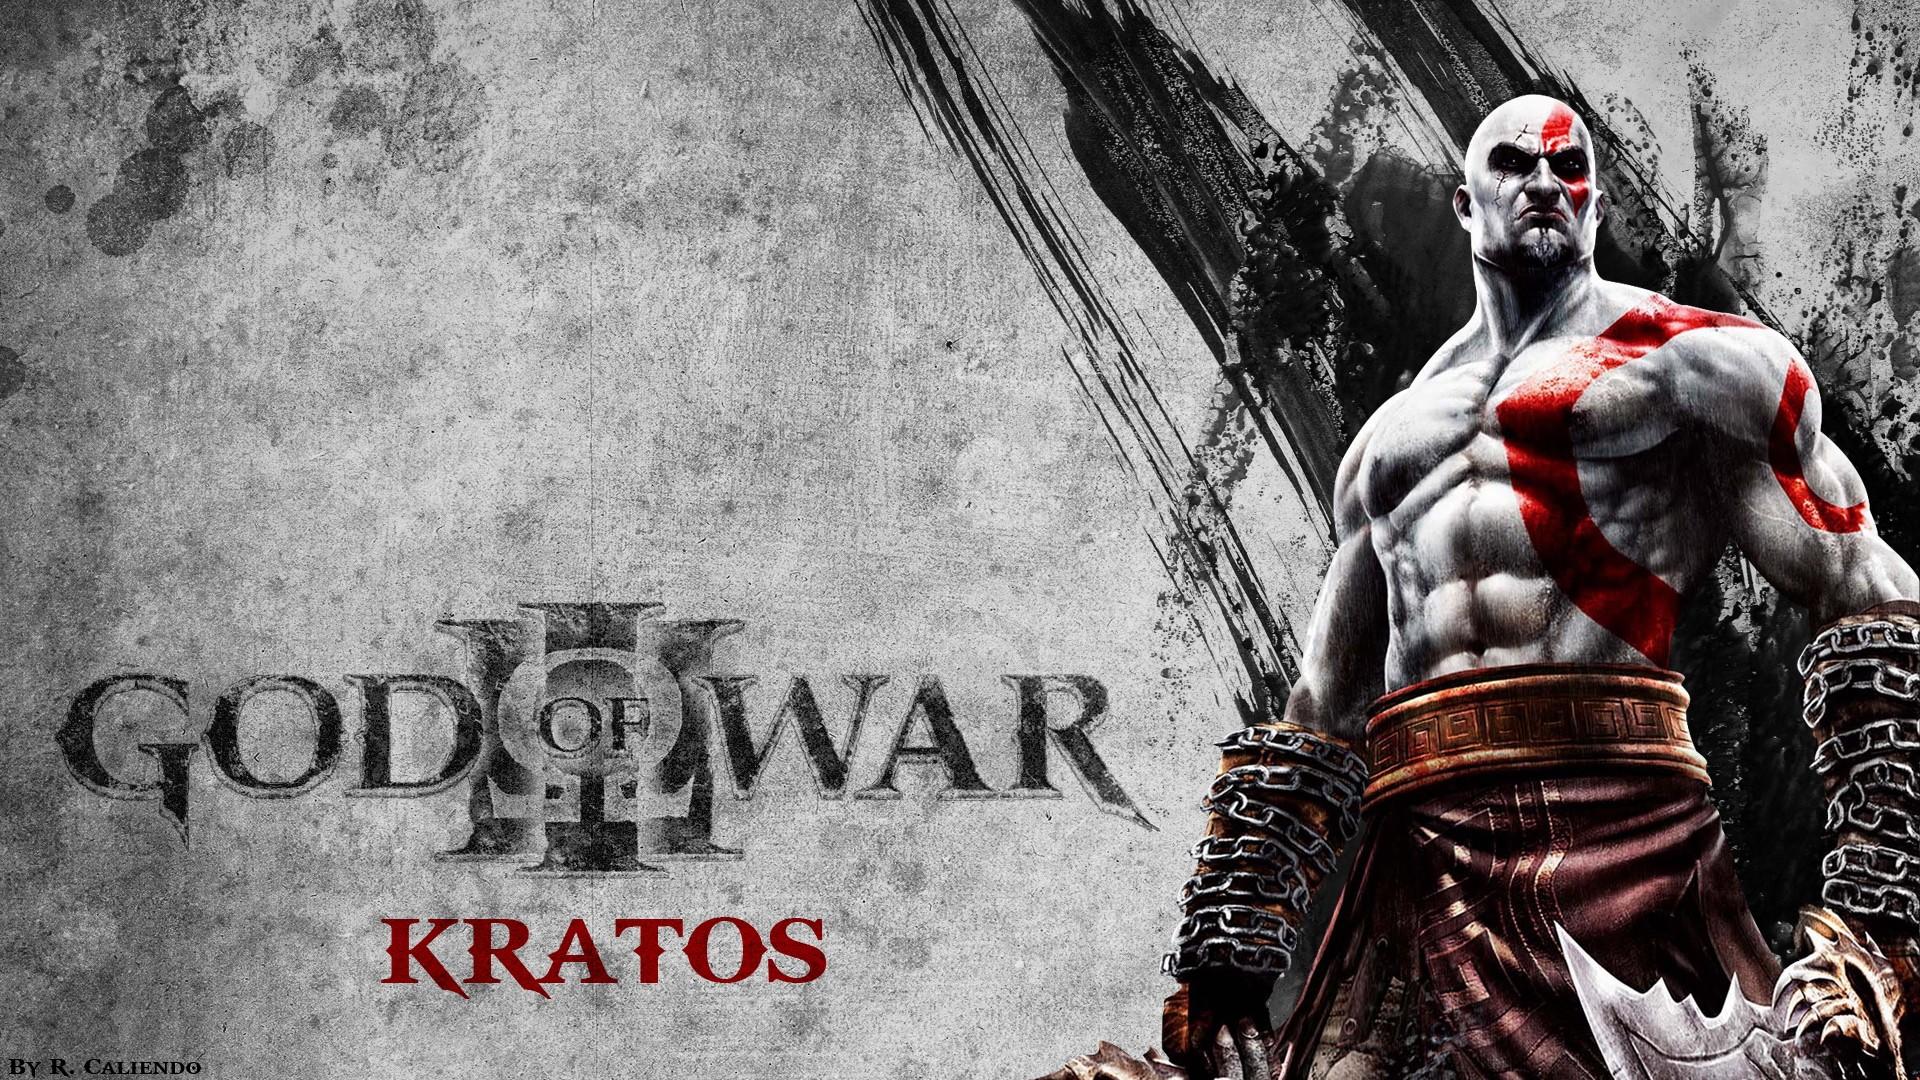 Free Download Kratos God Wallpaper 1920x1080 Kratos God Of War Pc